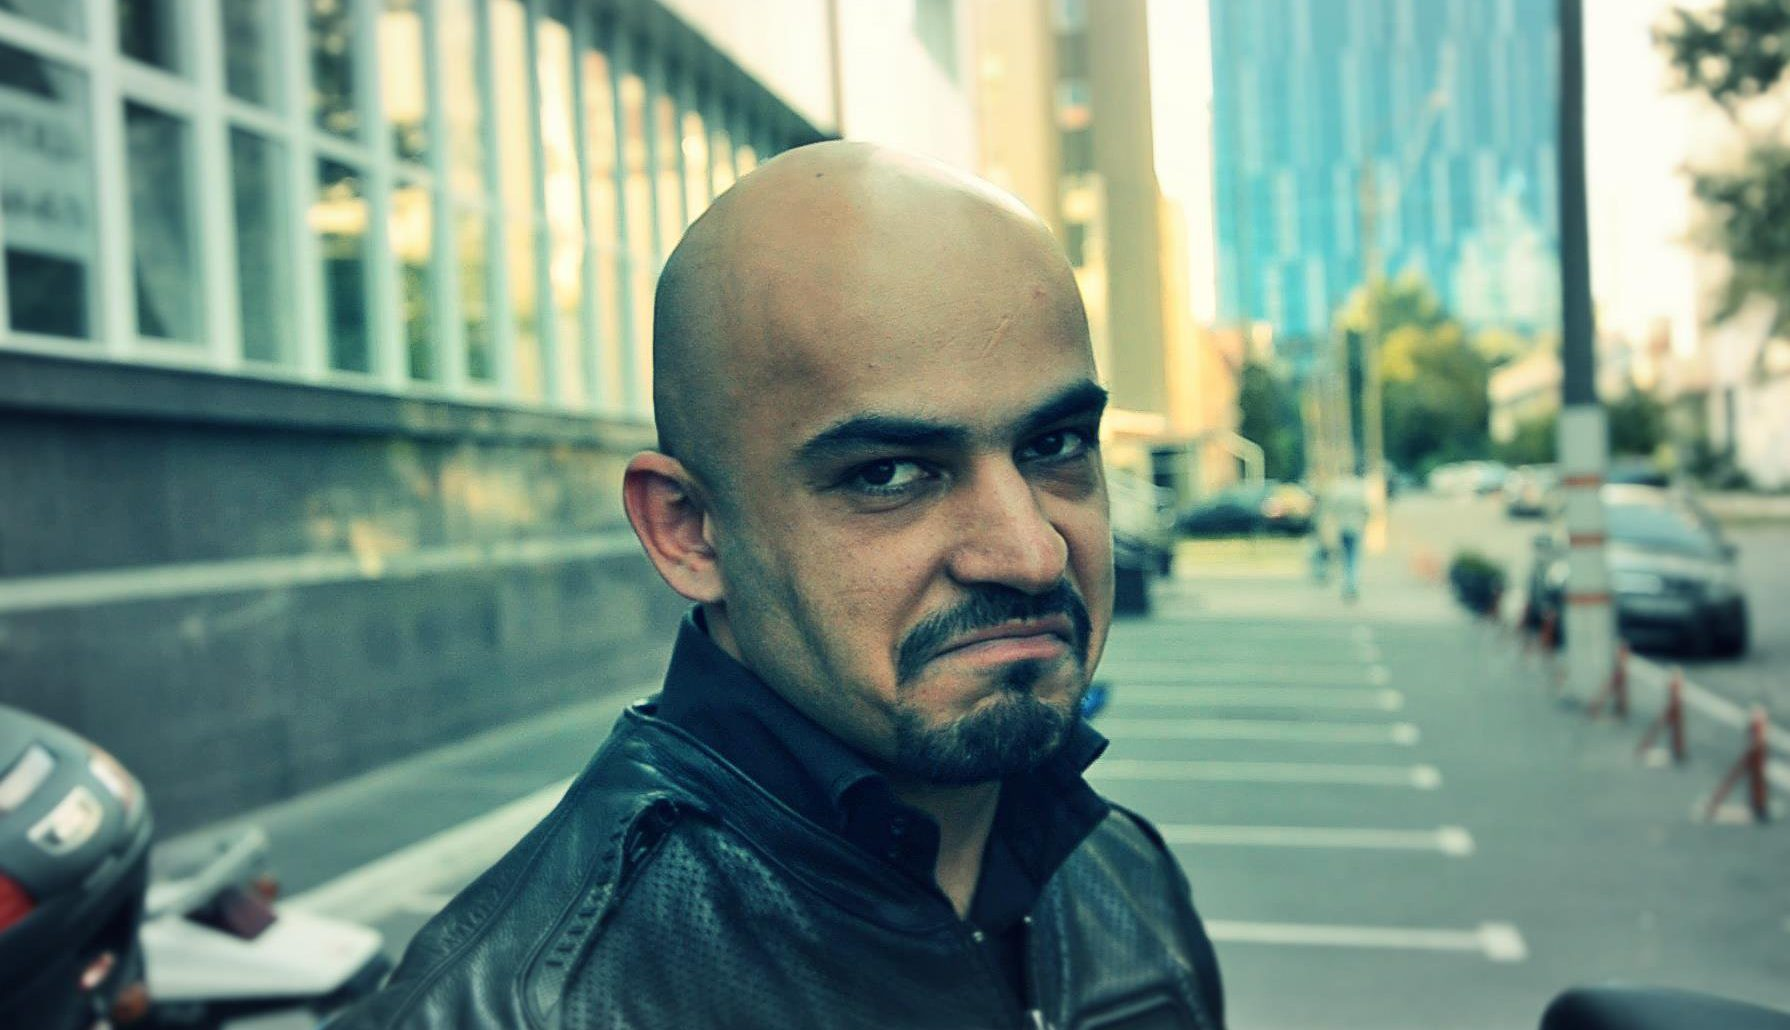 Маркетолог Тигипко за $600 раскрутил призыв Найема, с которого начался Евромайдан